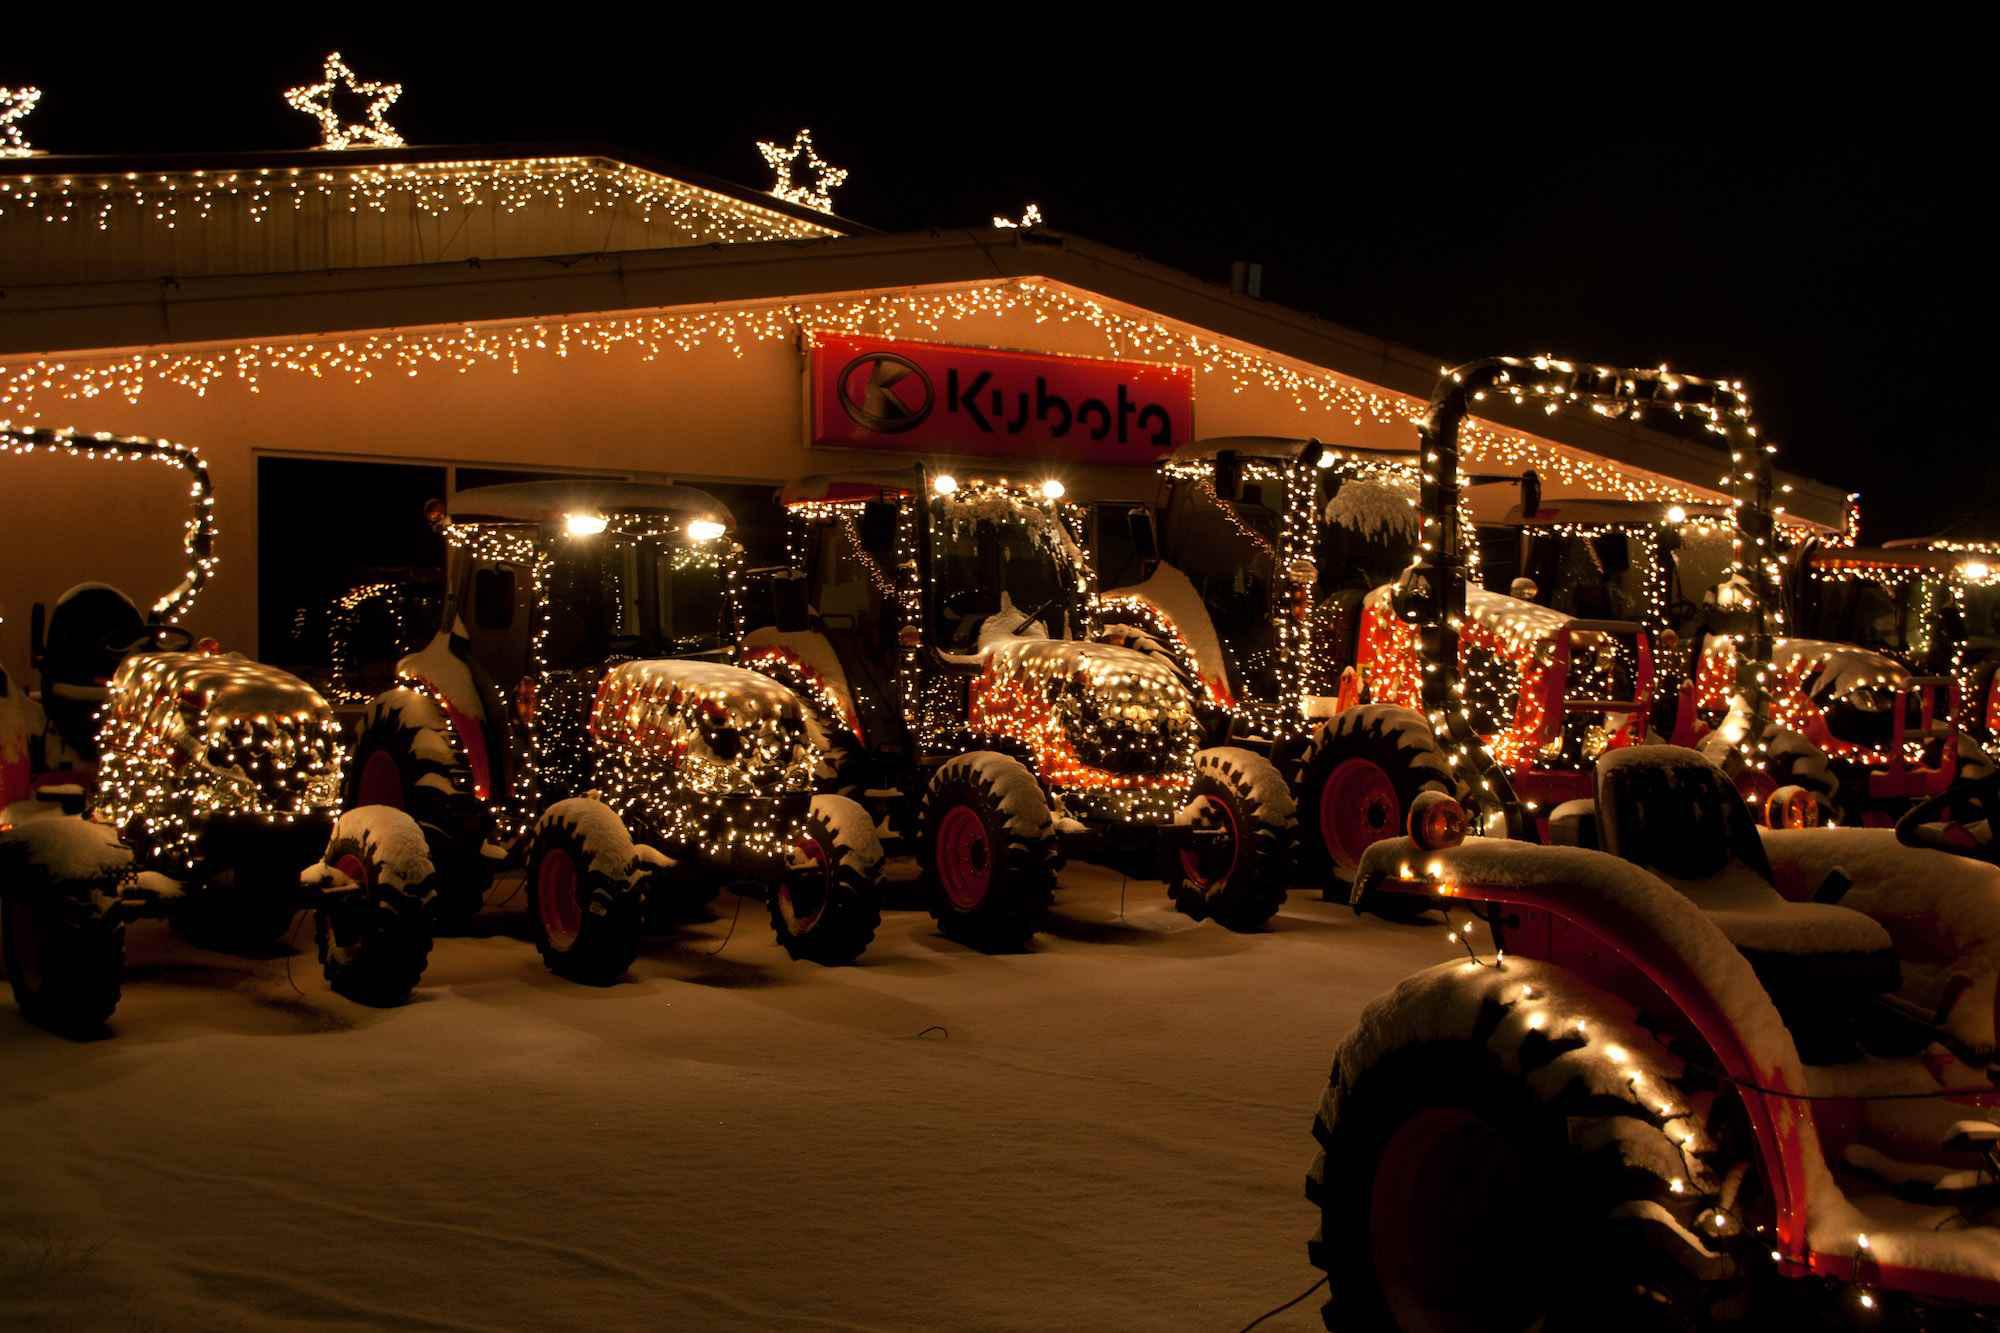 christmas light show near poughkeepsie ny